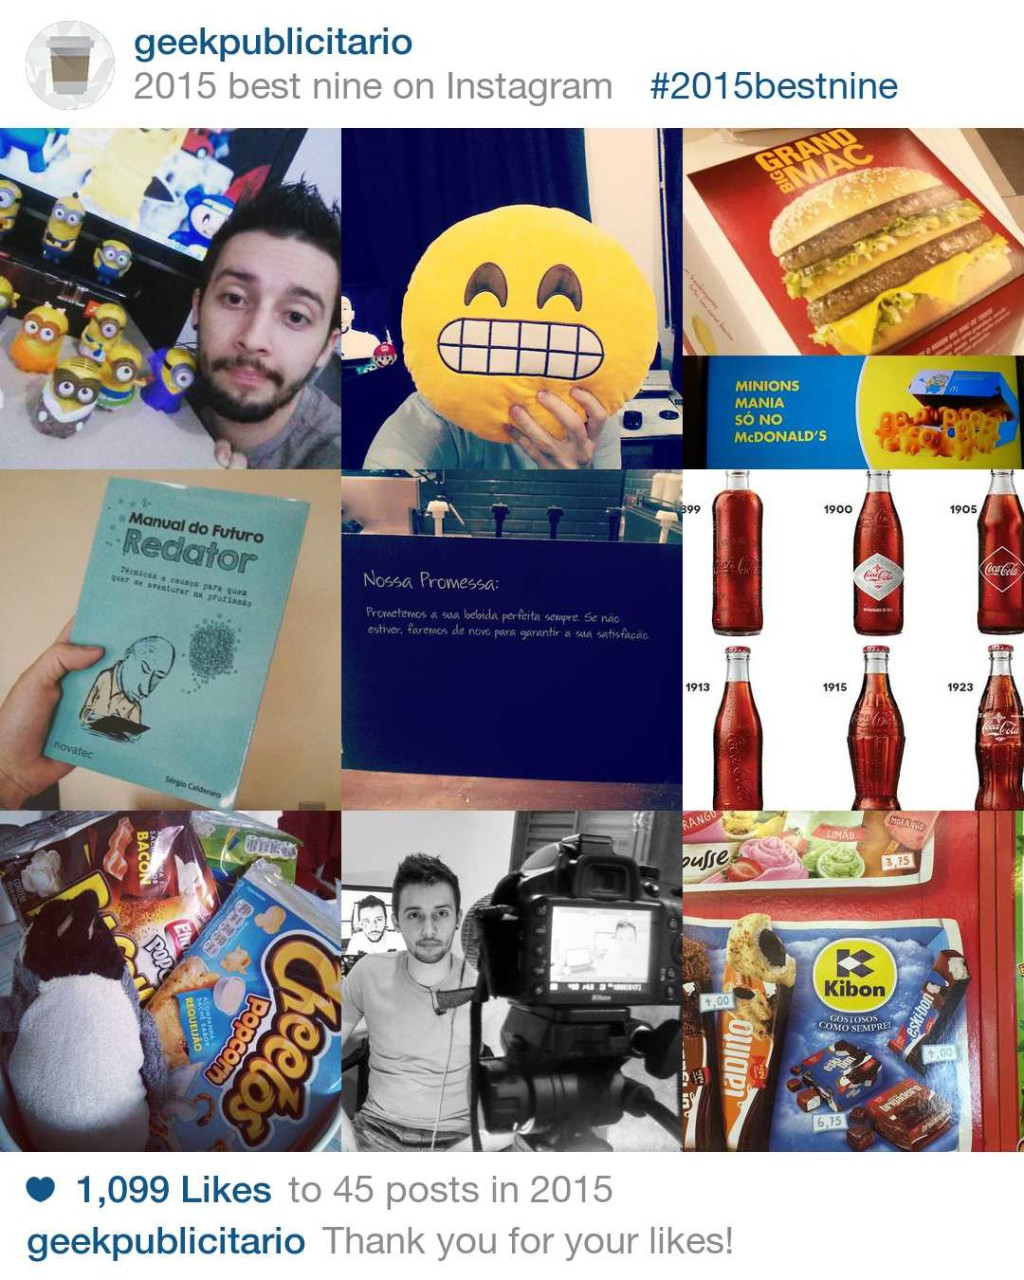 geek-publicitario-instagram-retrospectiva-completa